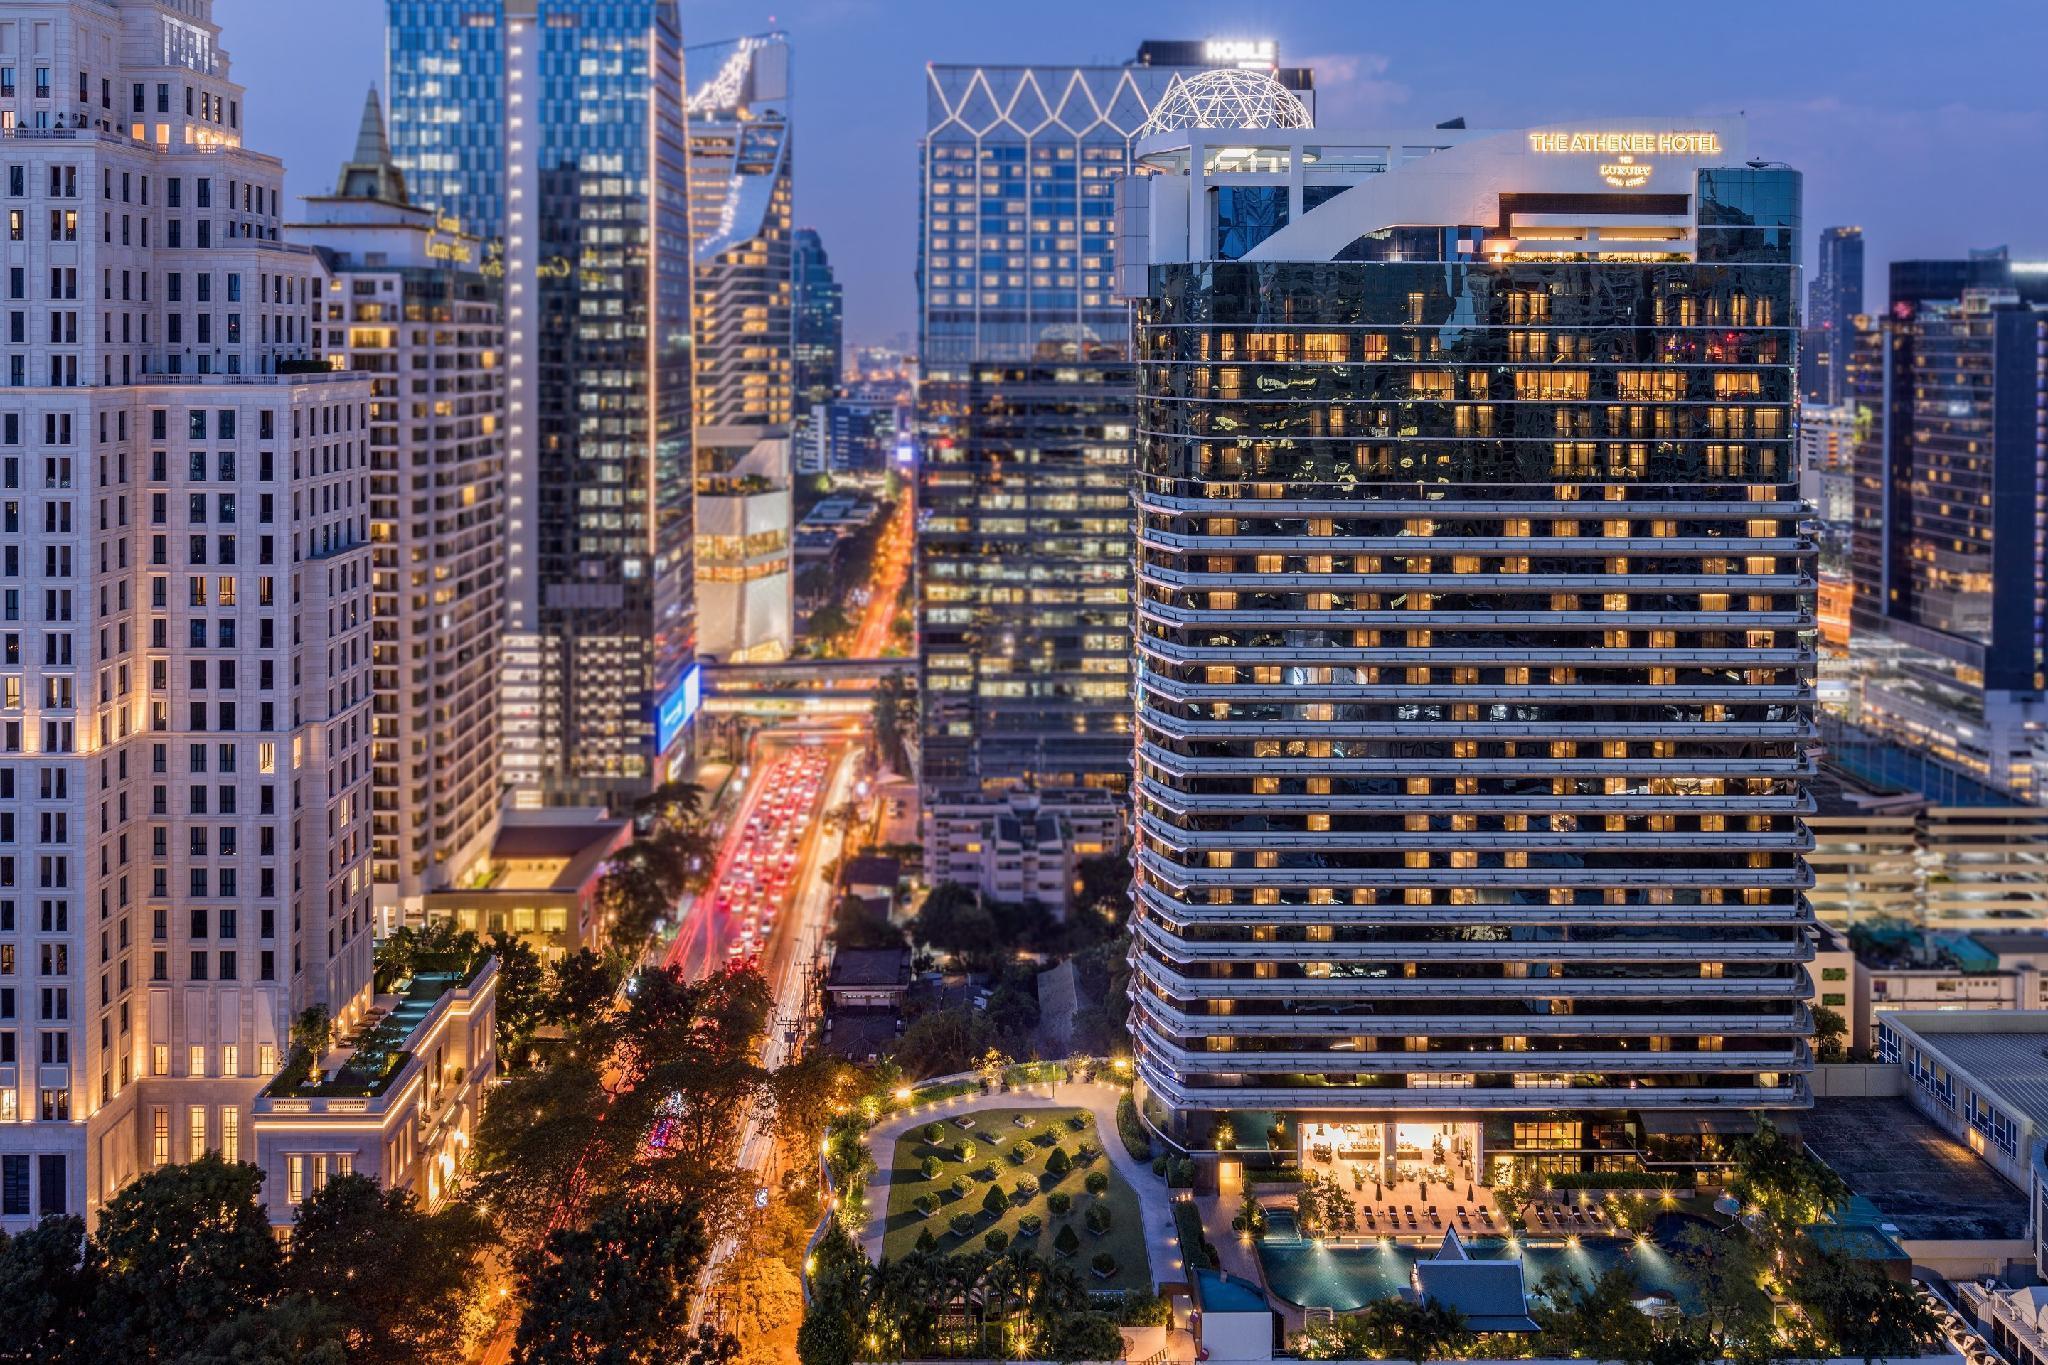 The Athenee Hotel A Luxury Collection Hotel Bangkok ดิ แอทธินี โฮเต็ล อะ ลักชัวรี คอลเลคชั่น โฮเต็ล กรุงเทพฯ